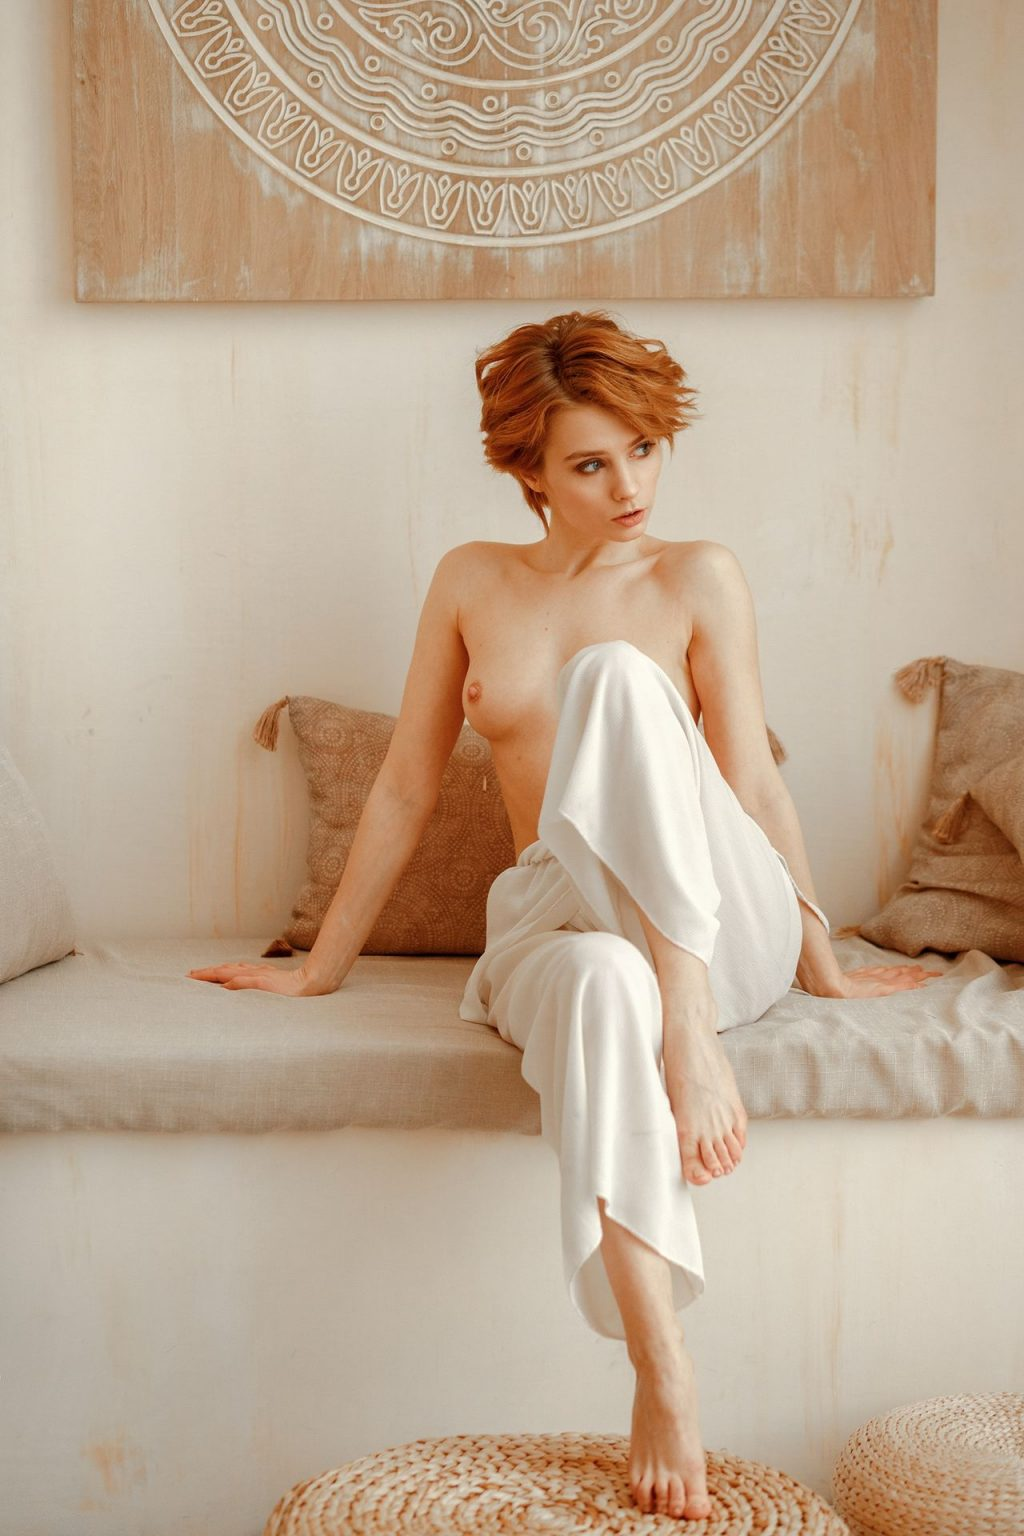 Marta Gromova (7 Nude Photos)